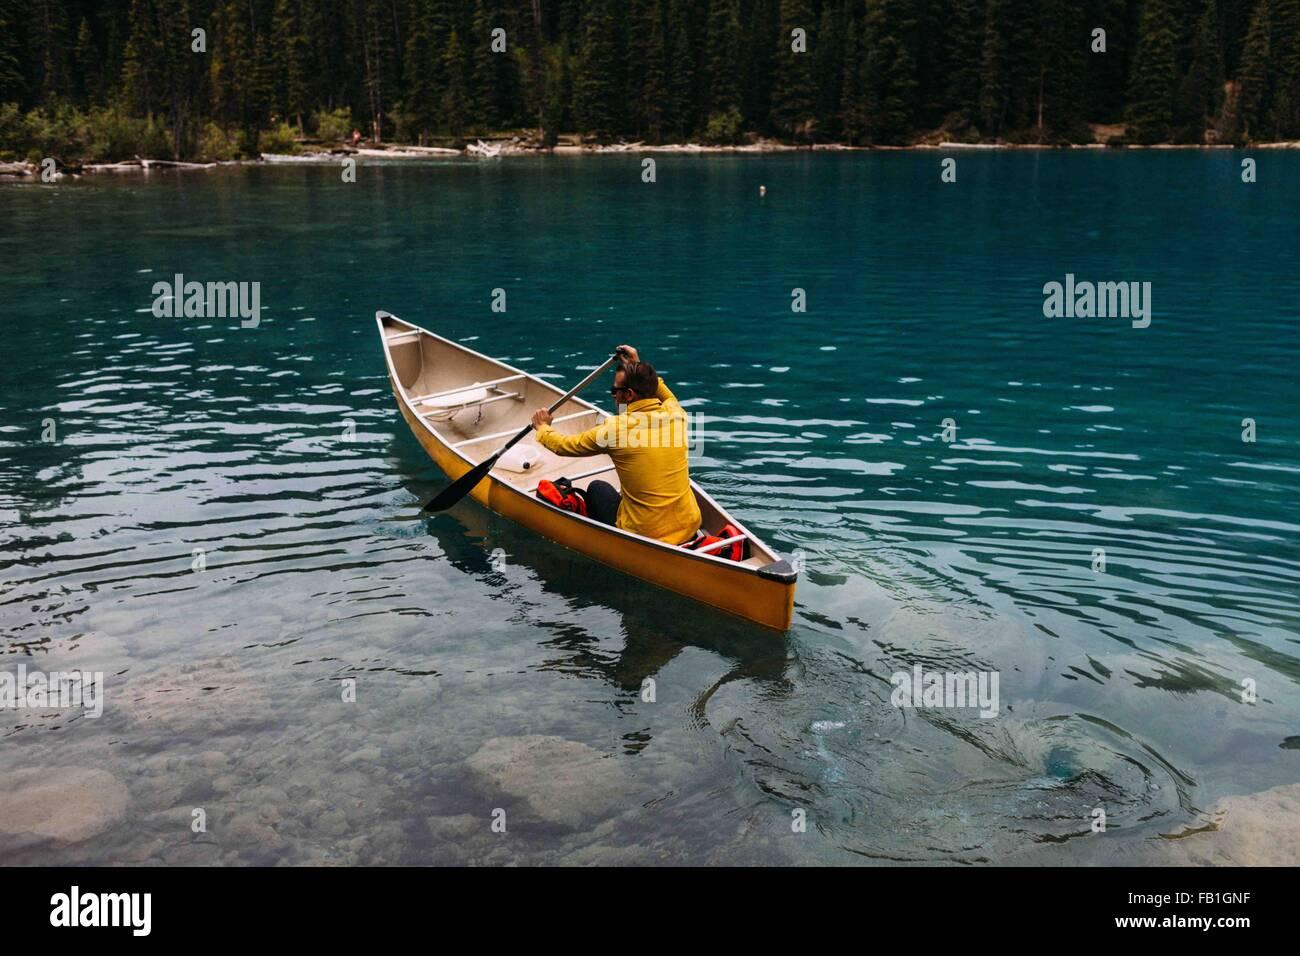 High angle rear view of mid adult man paddling canoe on Moraine lake, Banff National Park, Alberta Canada - Stock Image